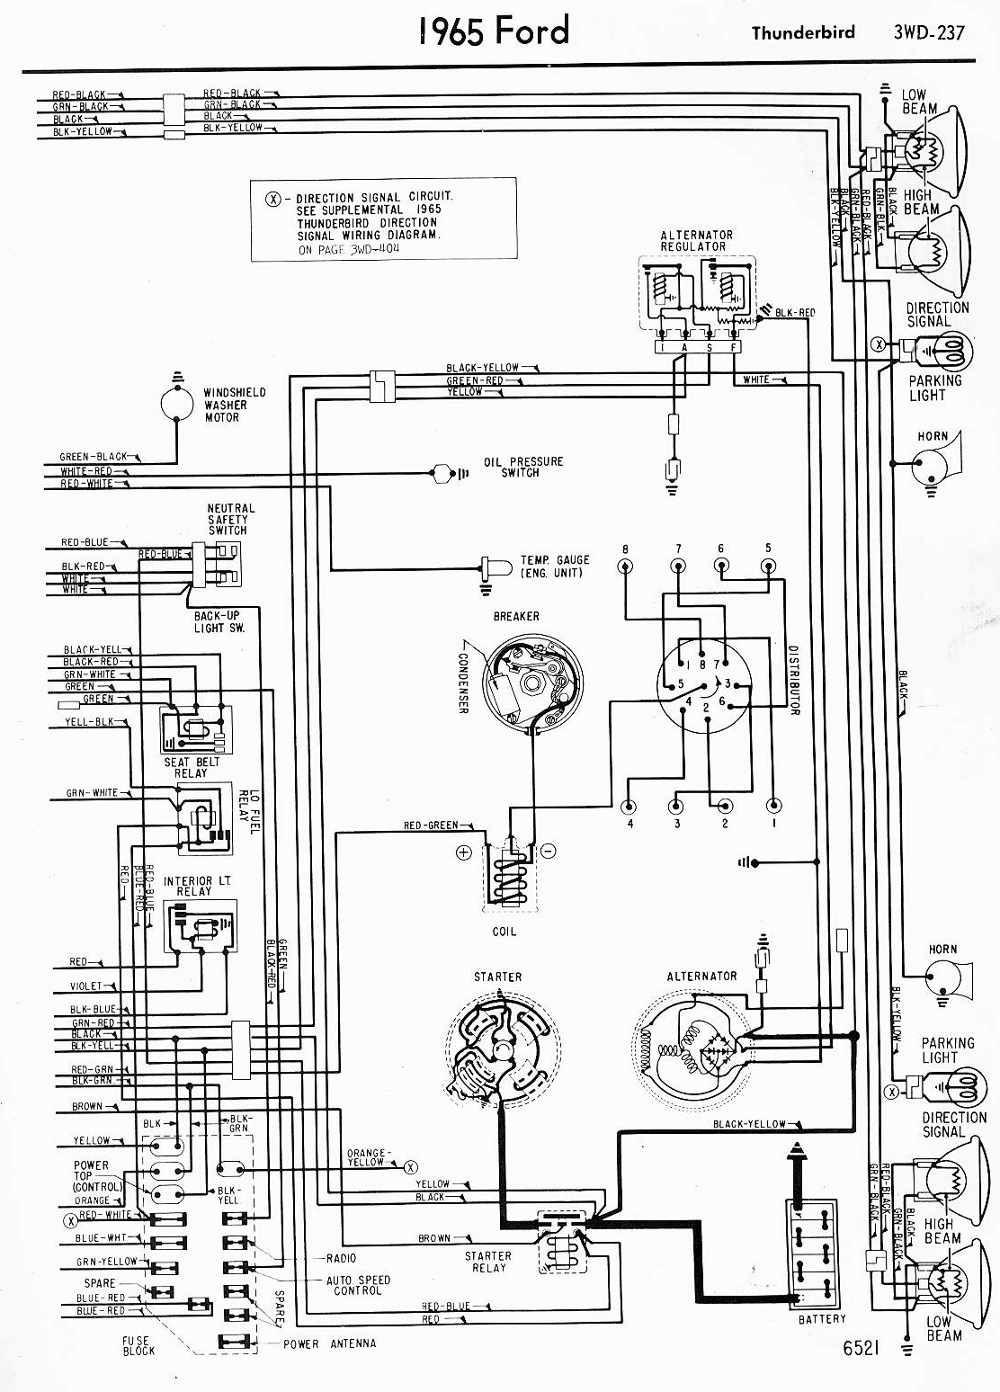 hight resolution of 1965 thunderbird power window wiring diagram schema wiring diagram 1965 thunderbird power window wiring diagram